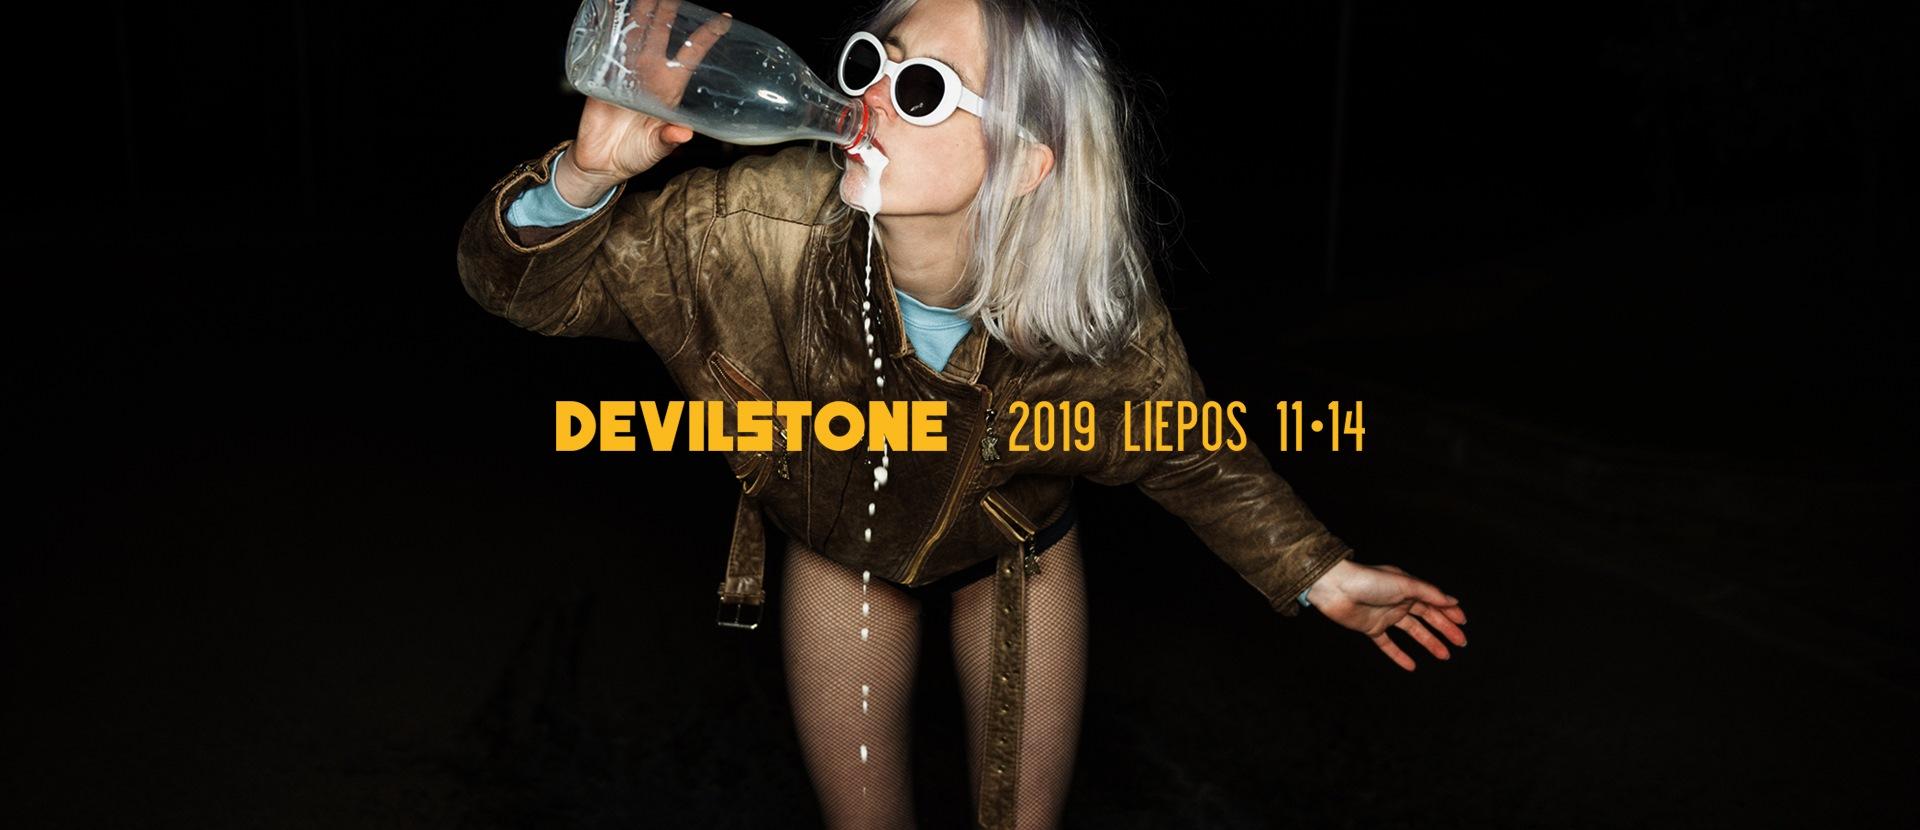 Devilstone 2019